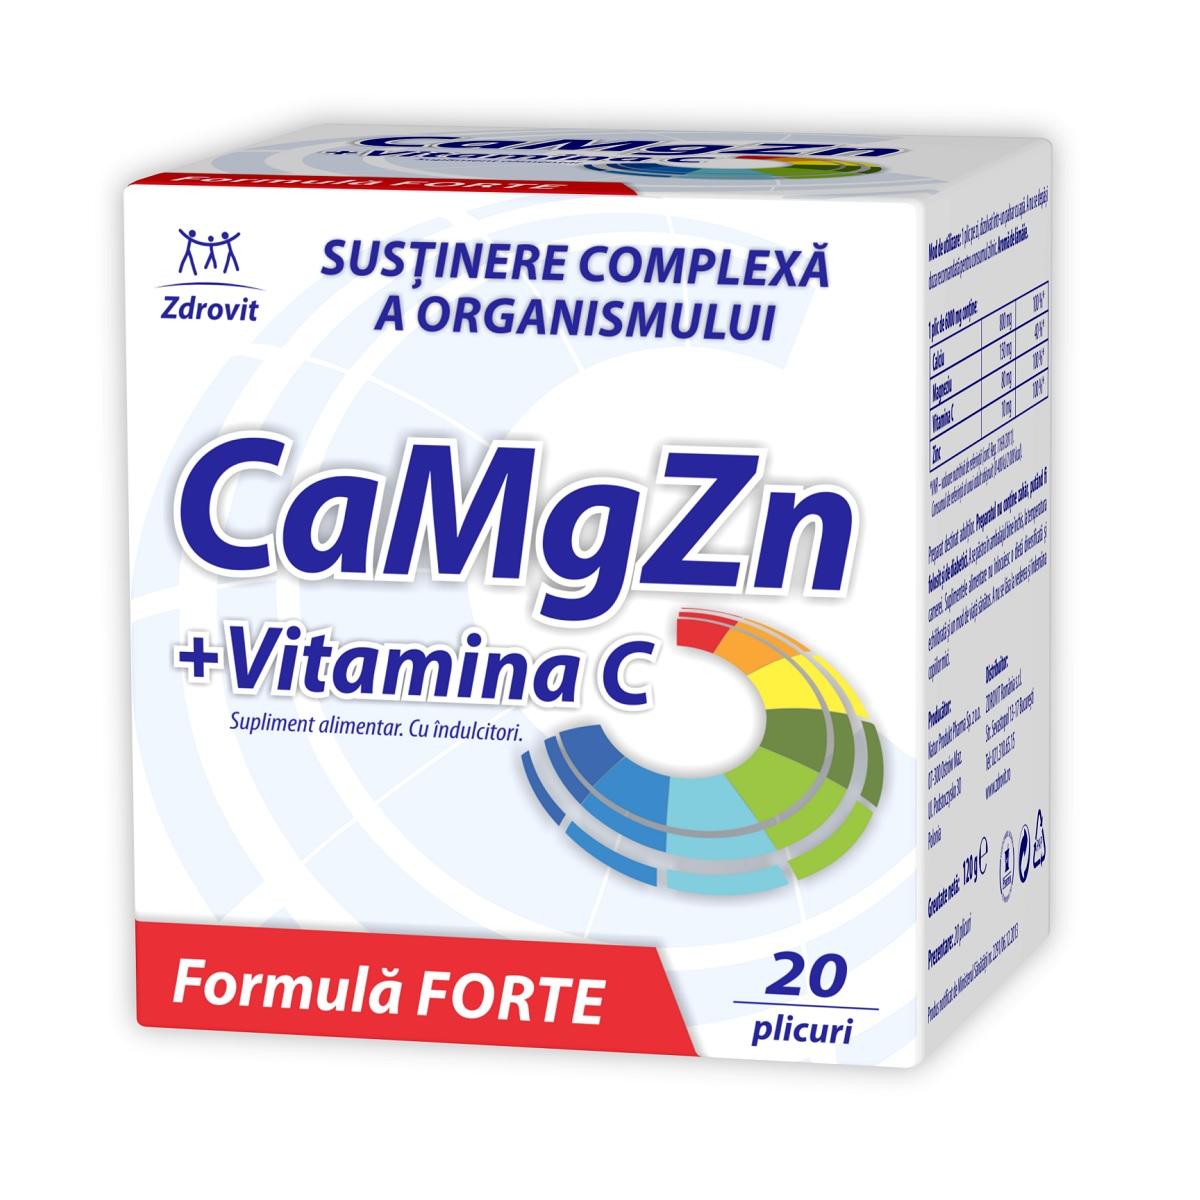 CaMgZn + Vitamina C, 20 plicuri, Zdrovit imagine produs 2021